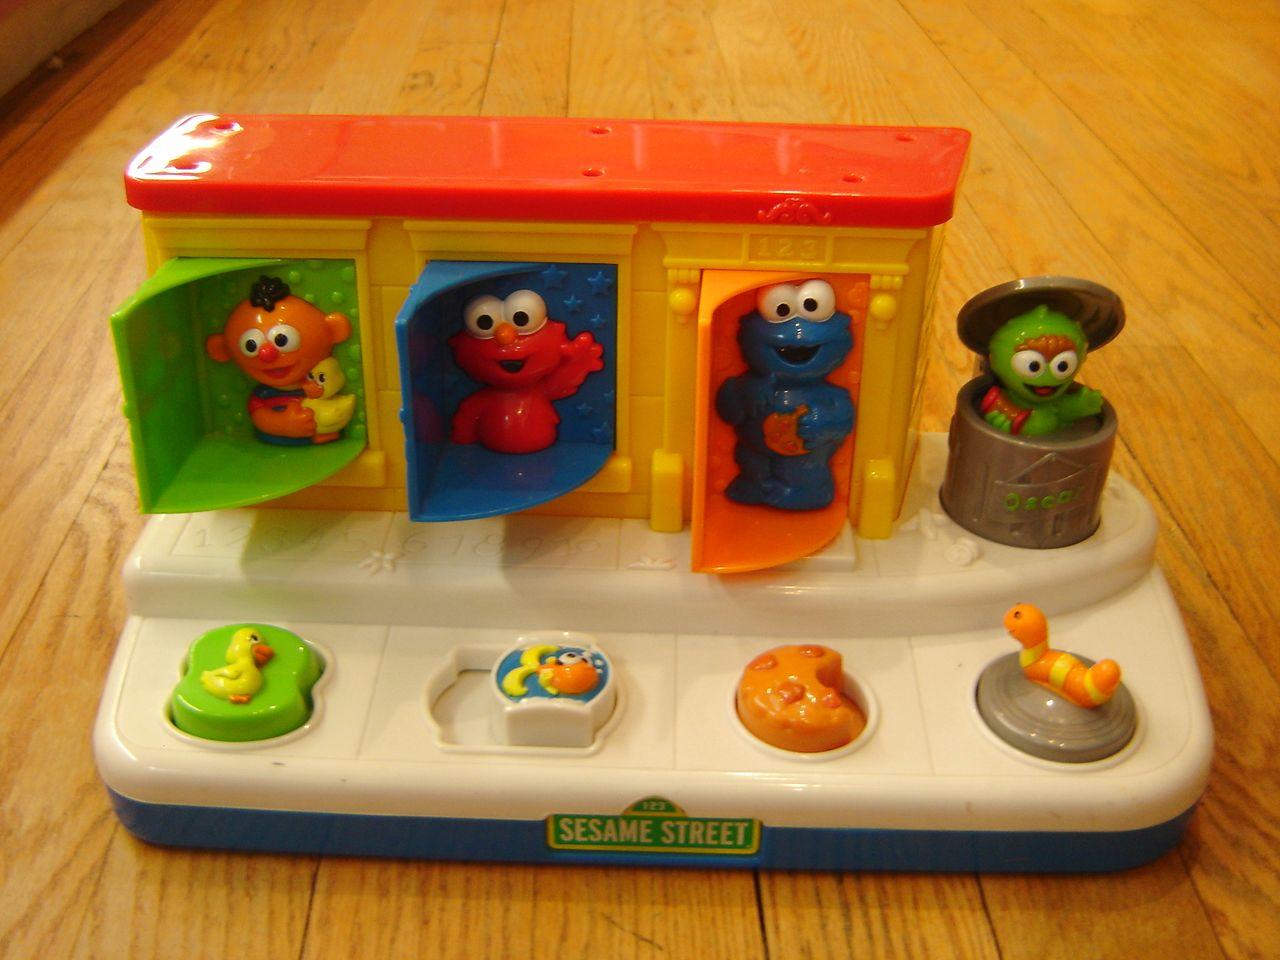 Sesame Street Musical Toys : Mattel sesame street workshop singing pop up pals musical